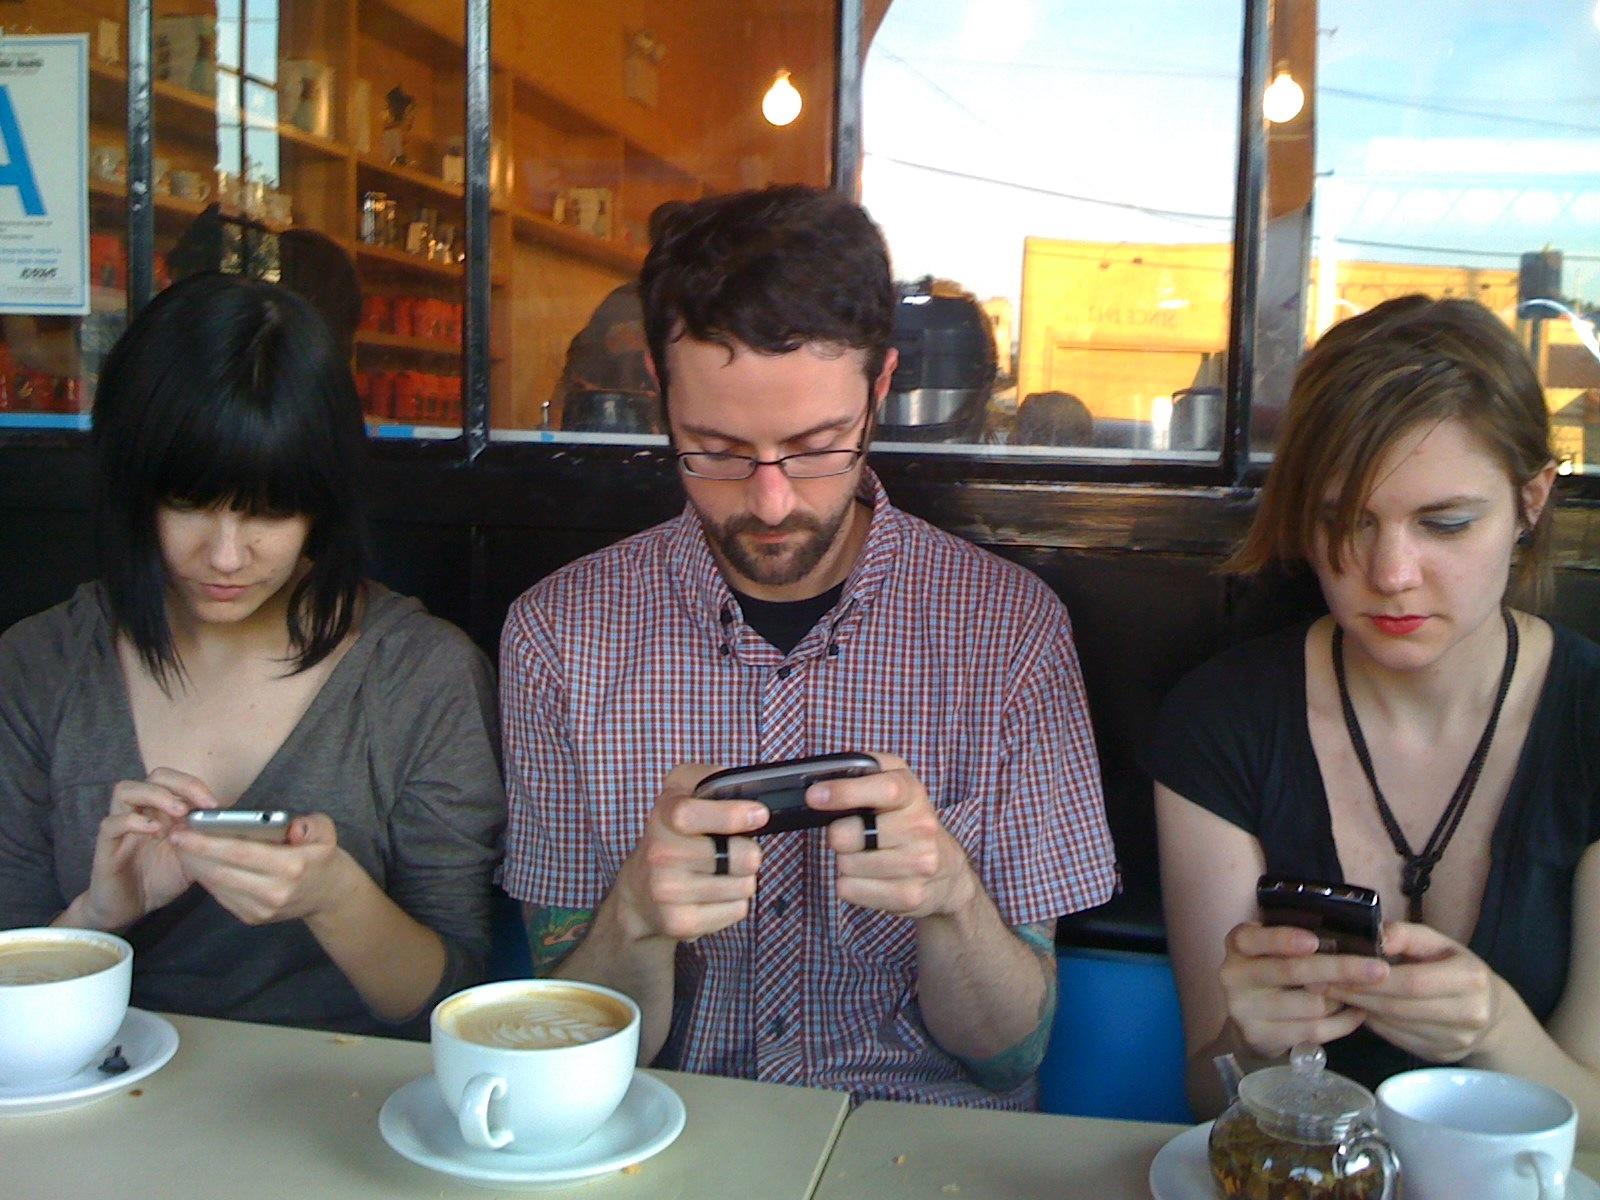 location based mobile marketing